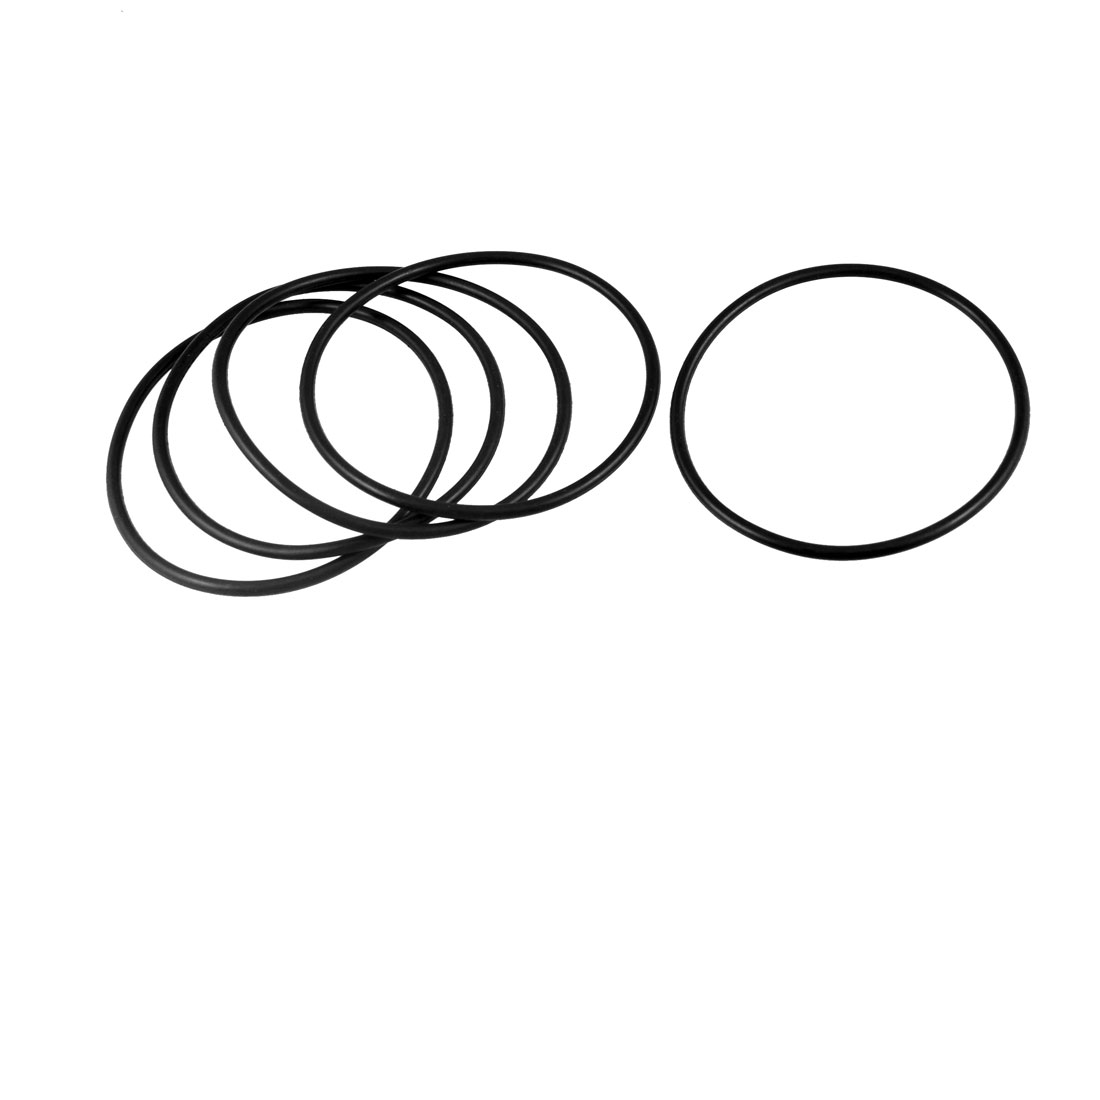 5 Pcs Nitrile Rubber O Ring Oil Sealing Gasket Black 90mm x 4mm